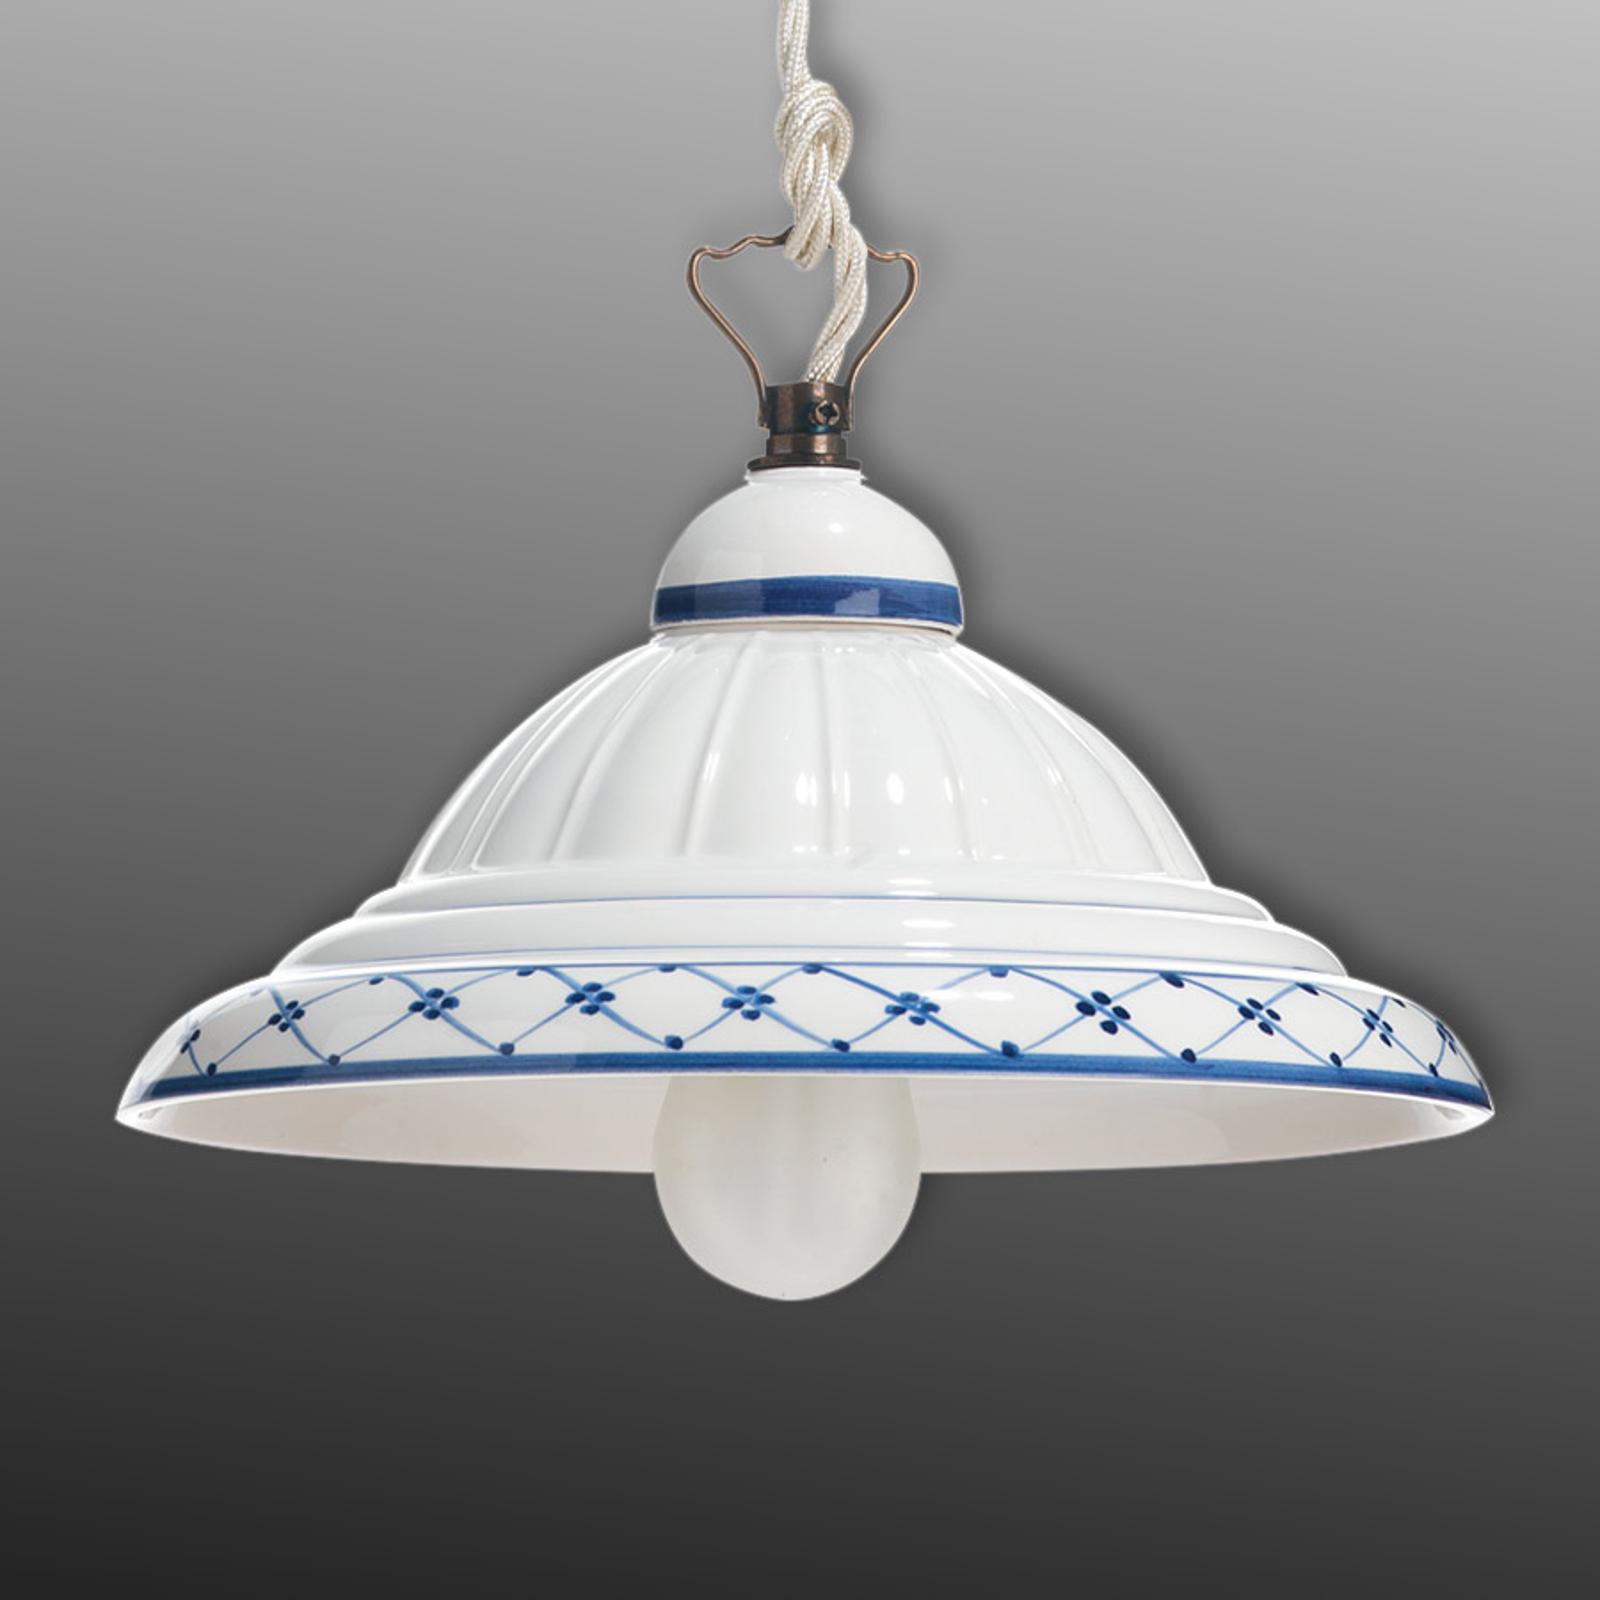 Keramiktaklampa Firenze i lantlig stil